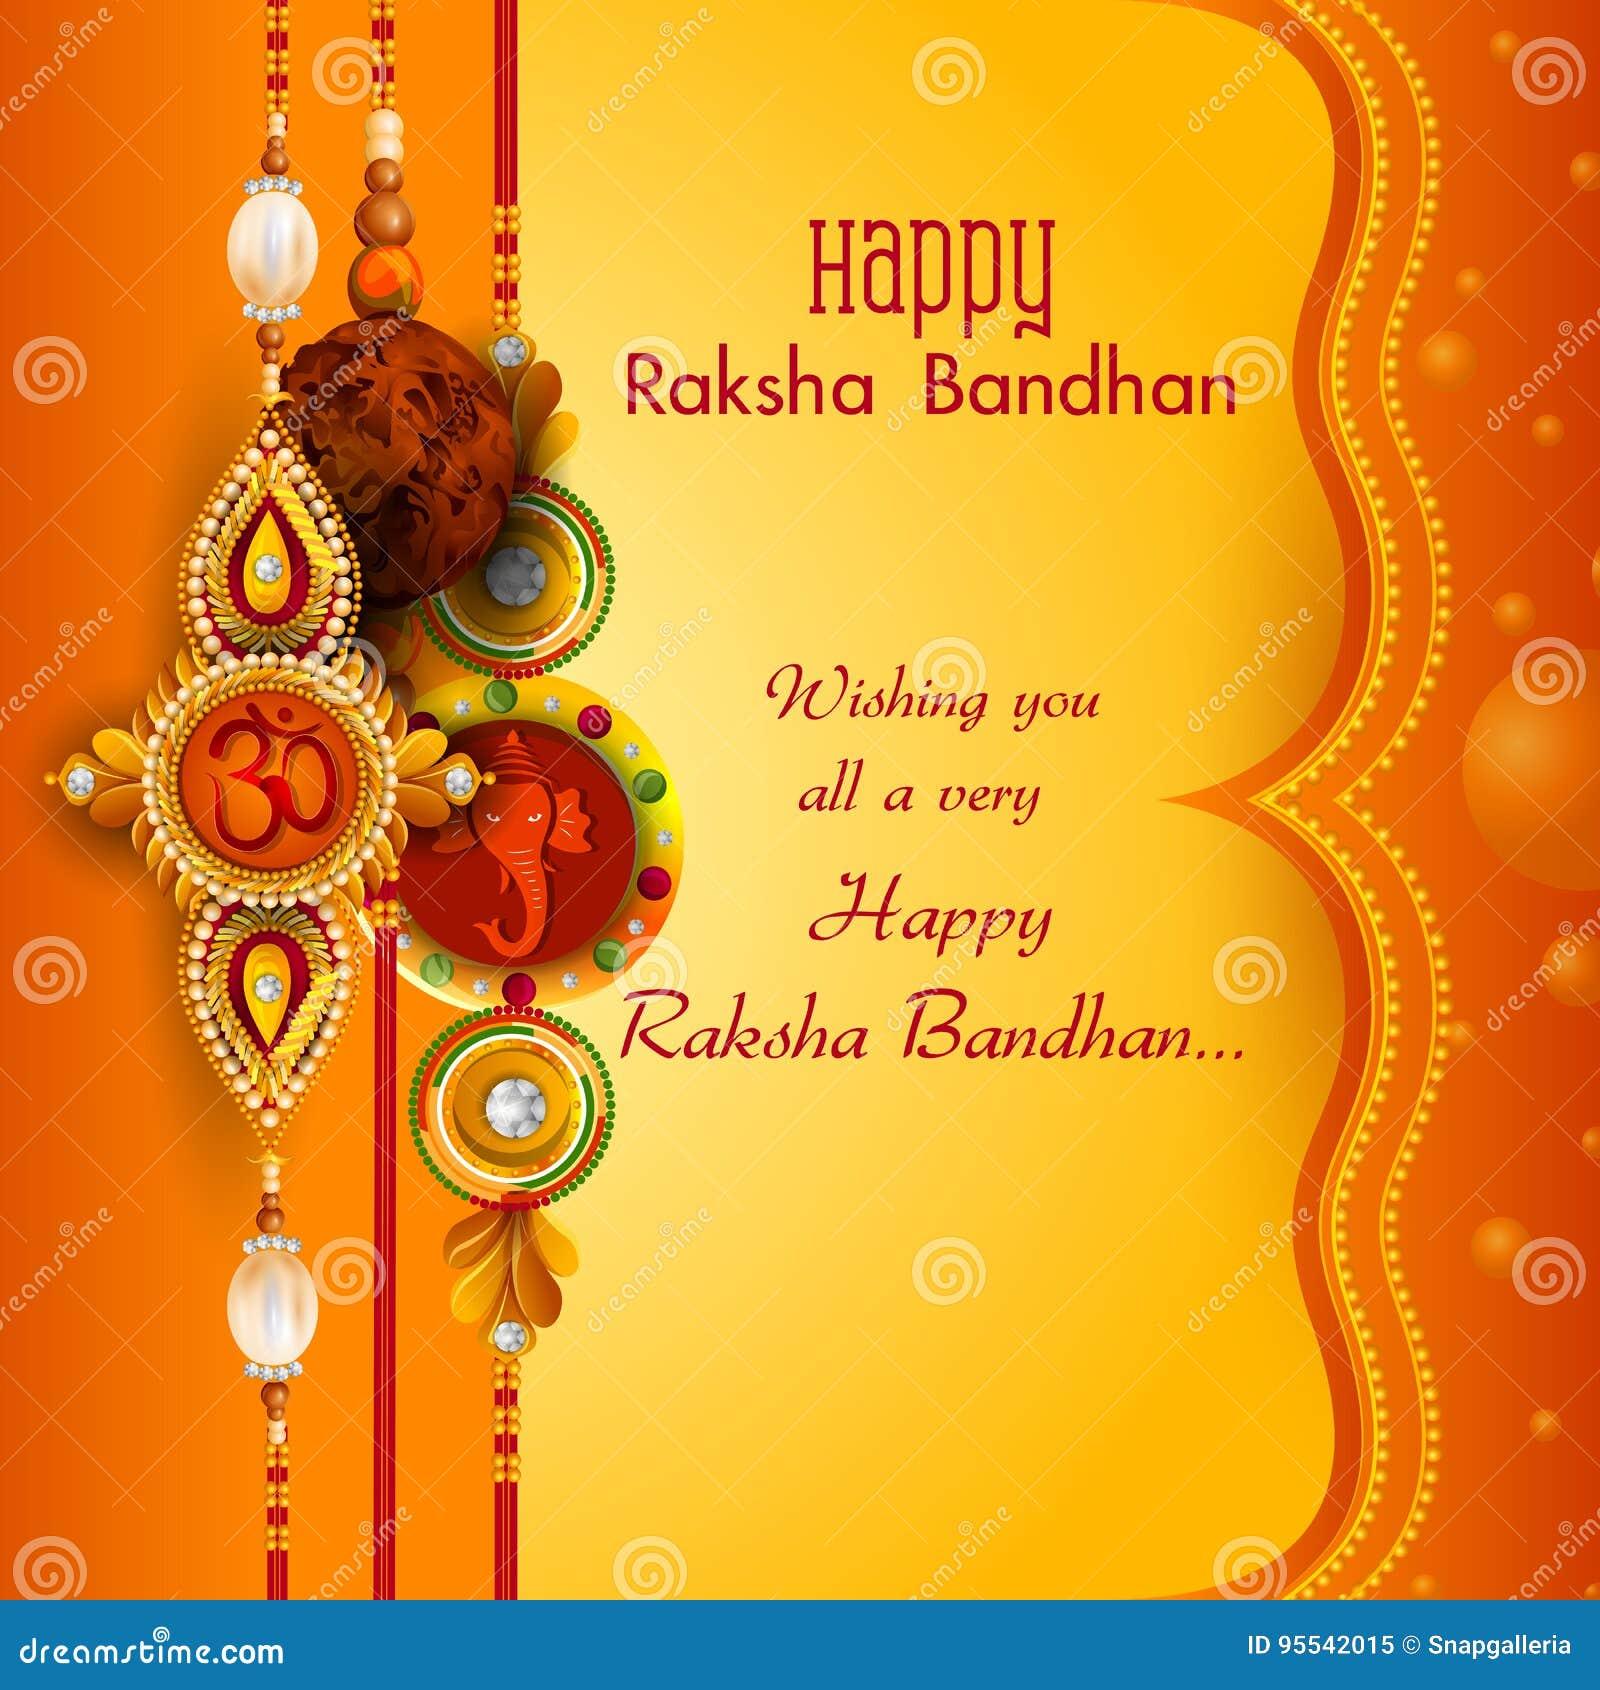 Rakhi Festival Quotes Brother: Rakhi Background For Indian Festival Raksha Bandhan